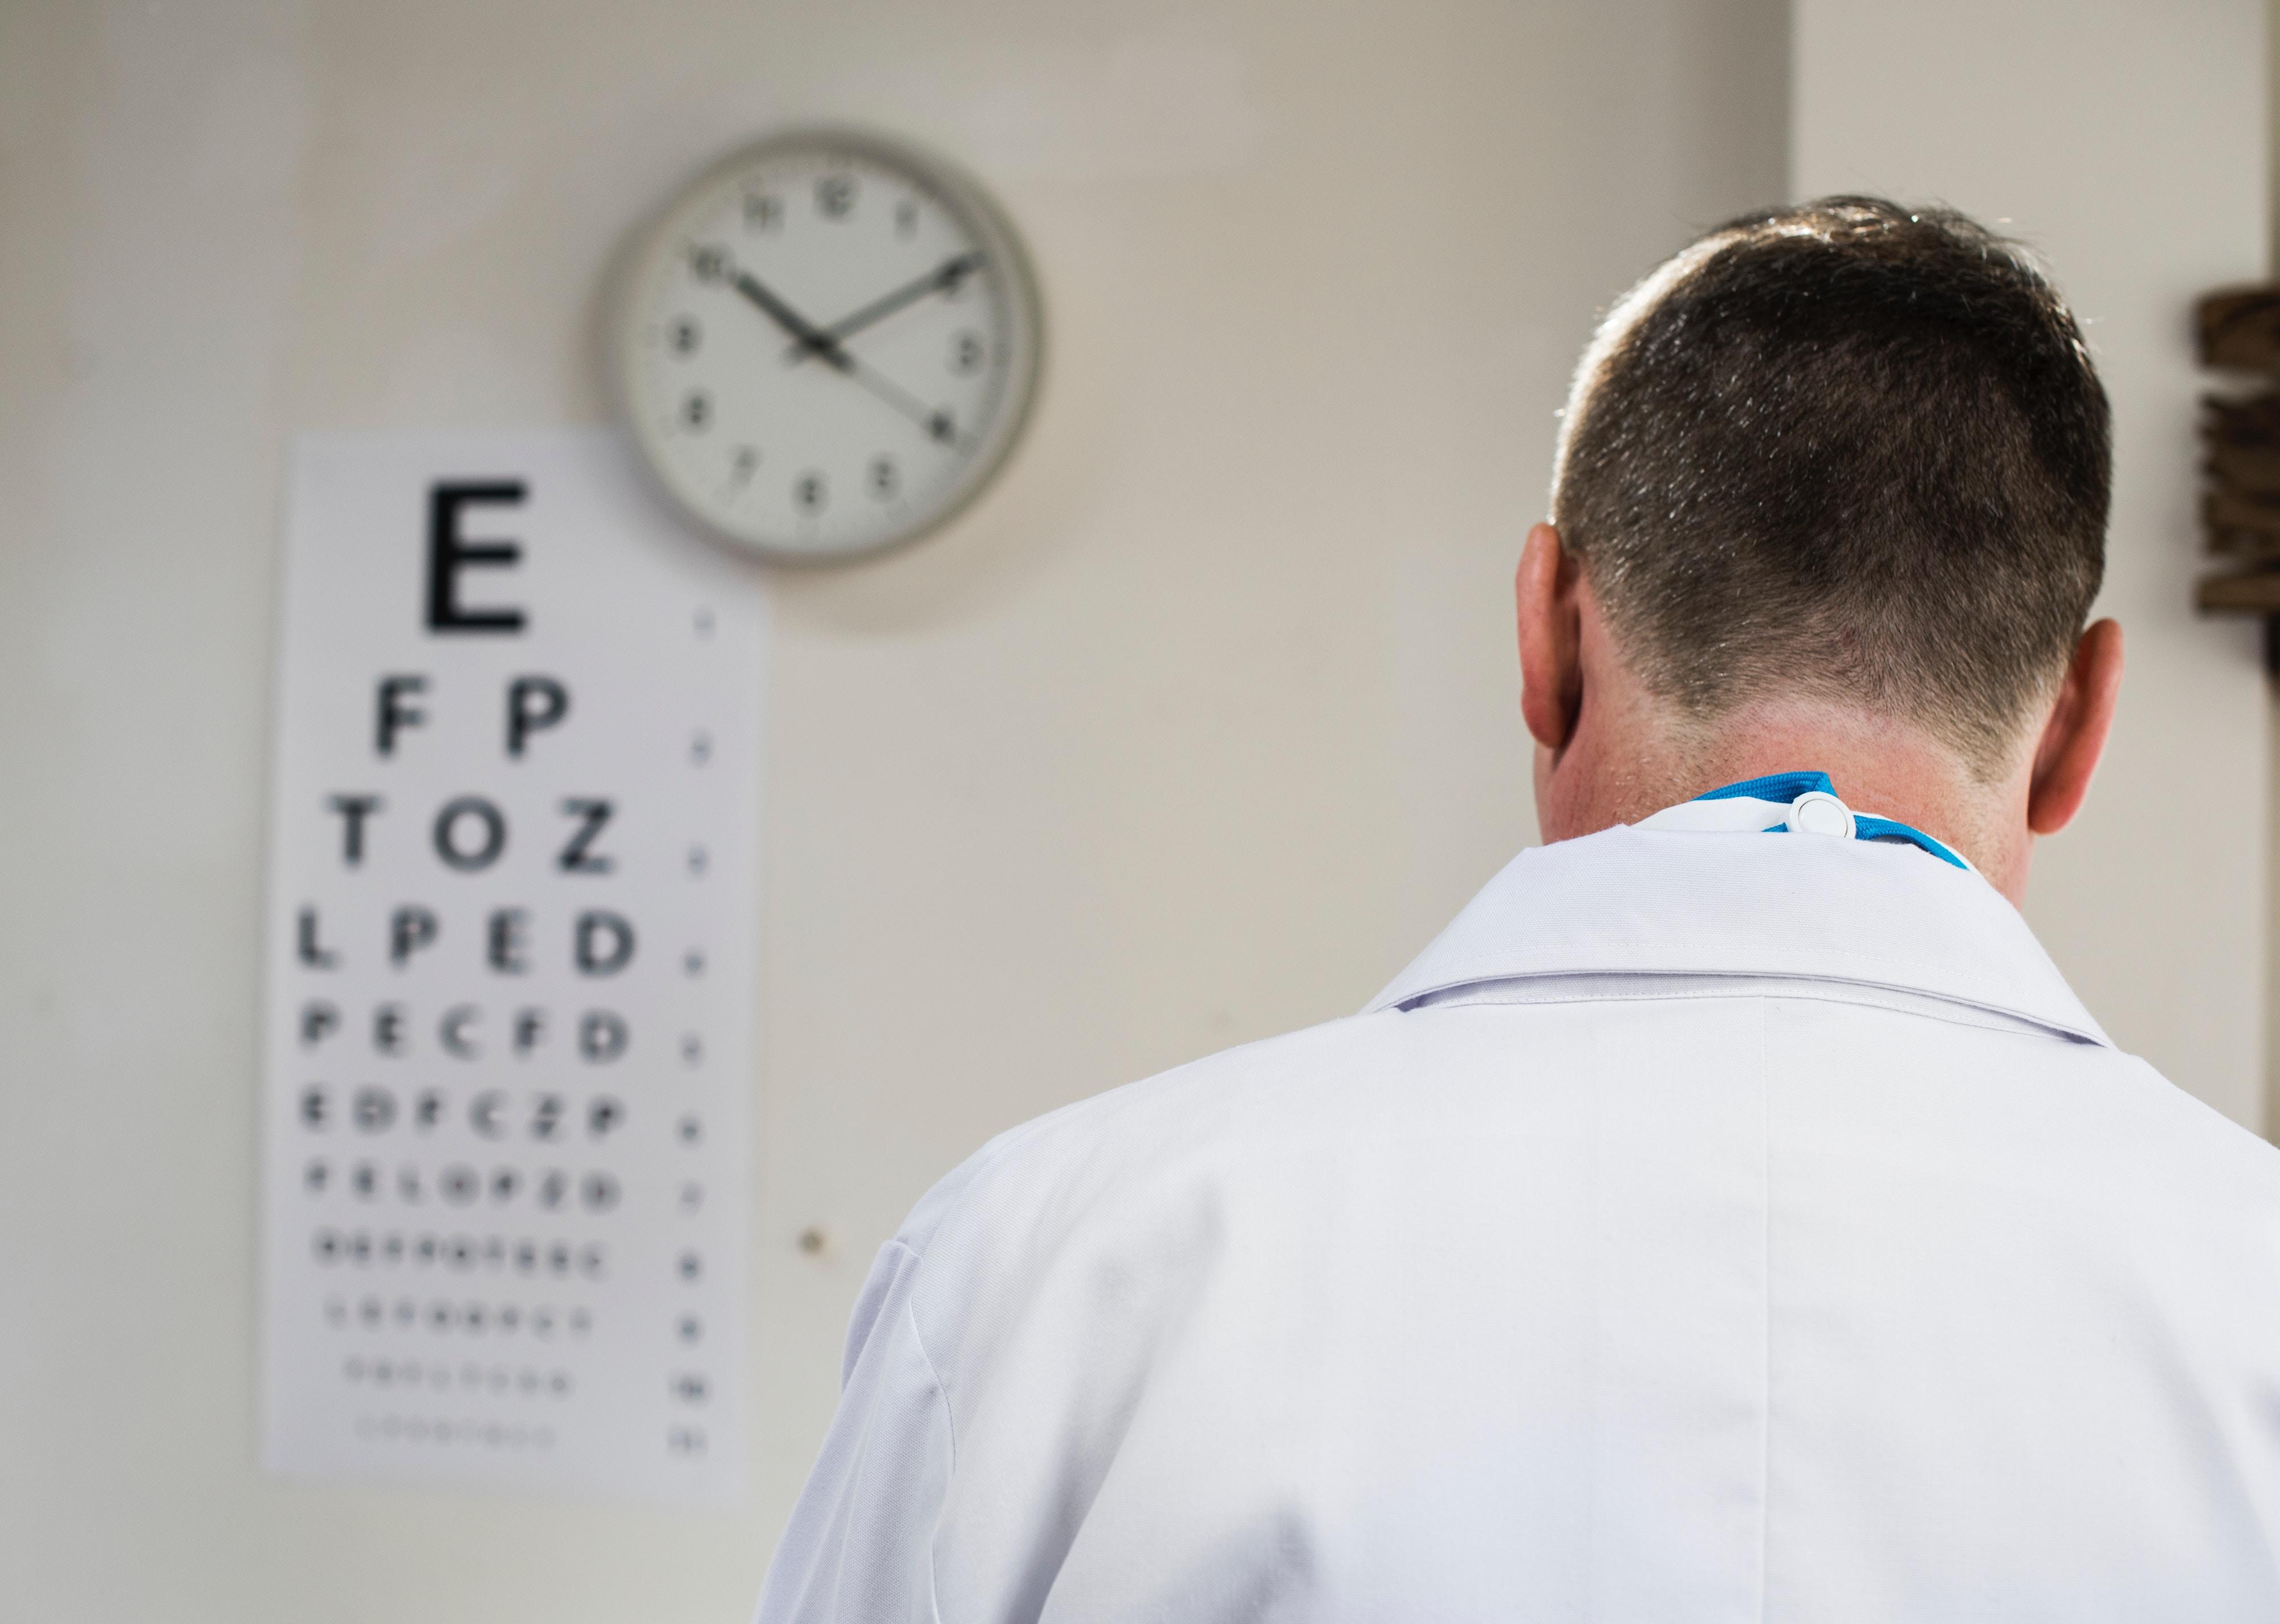 An eye doctor's office